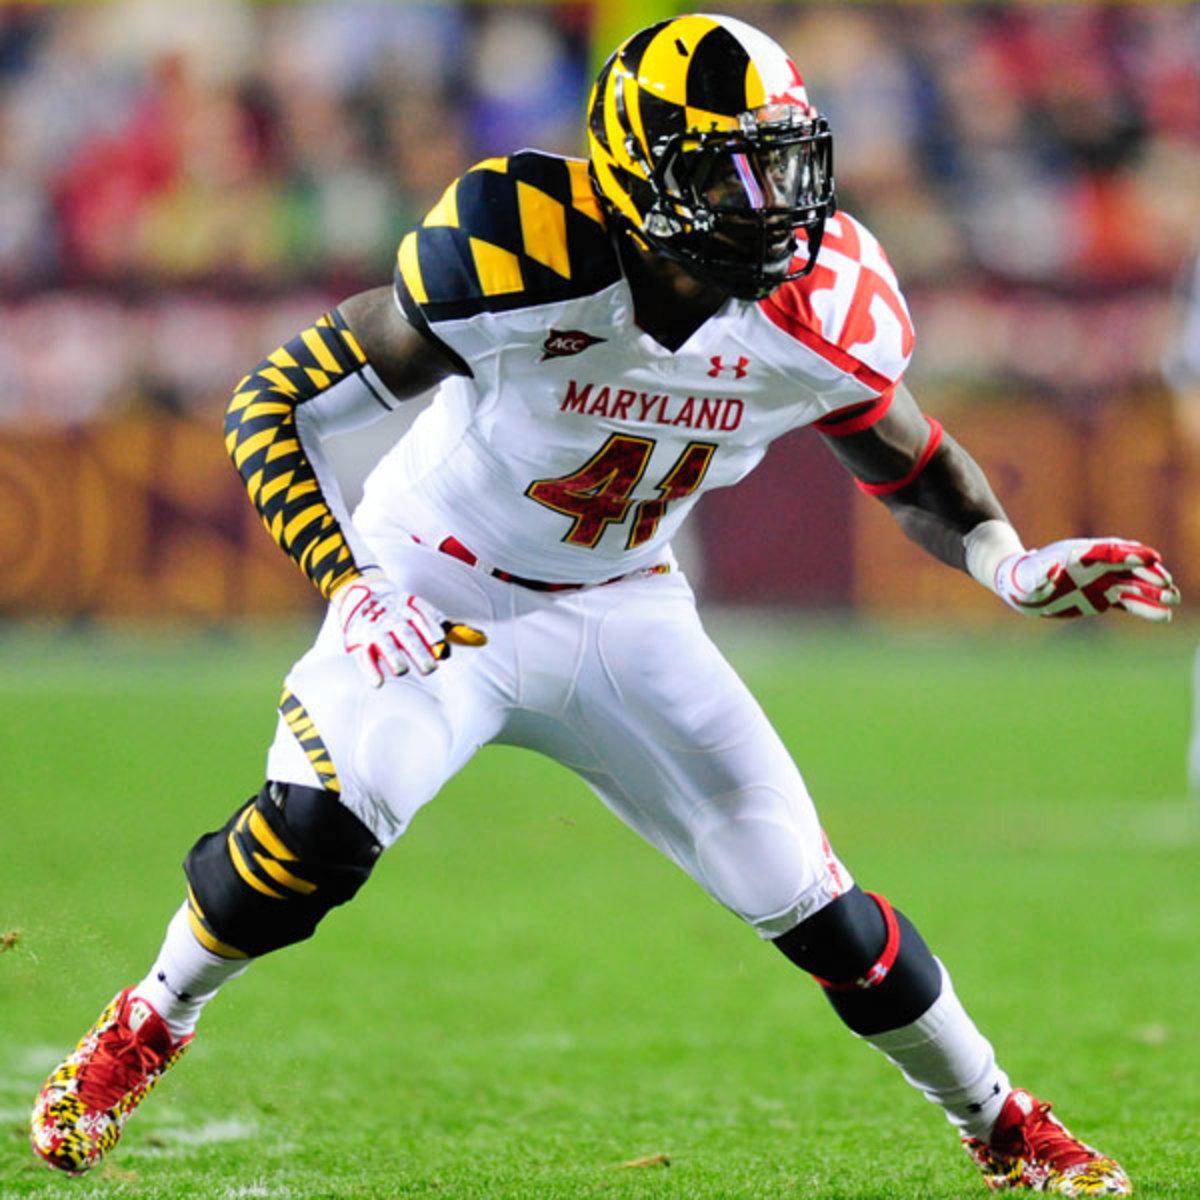 Maryland Terrapins Ugly Football Uniform